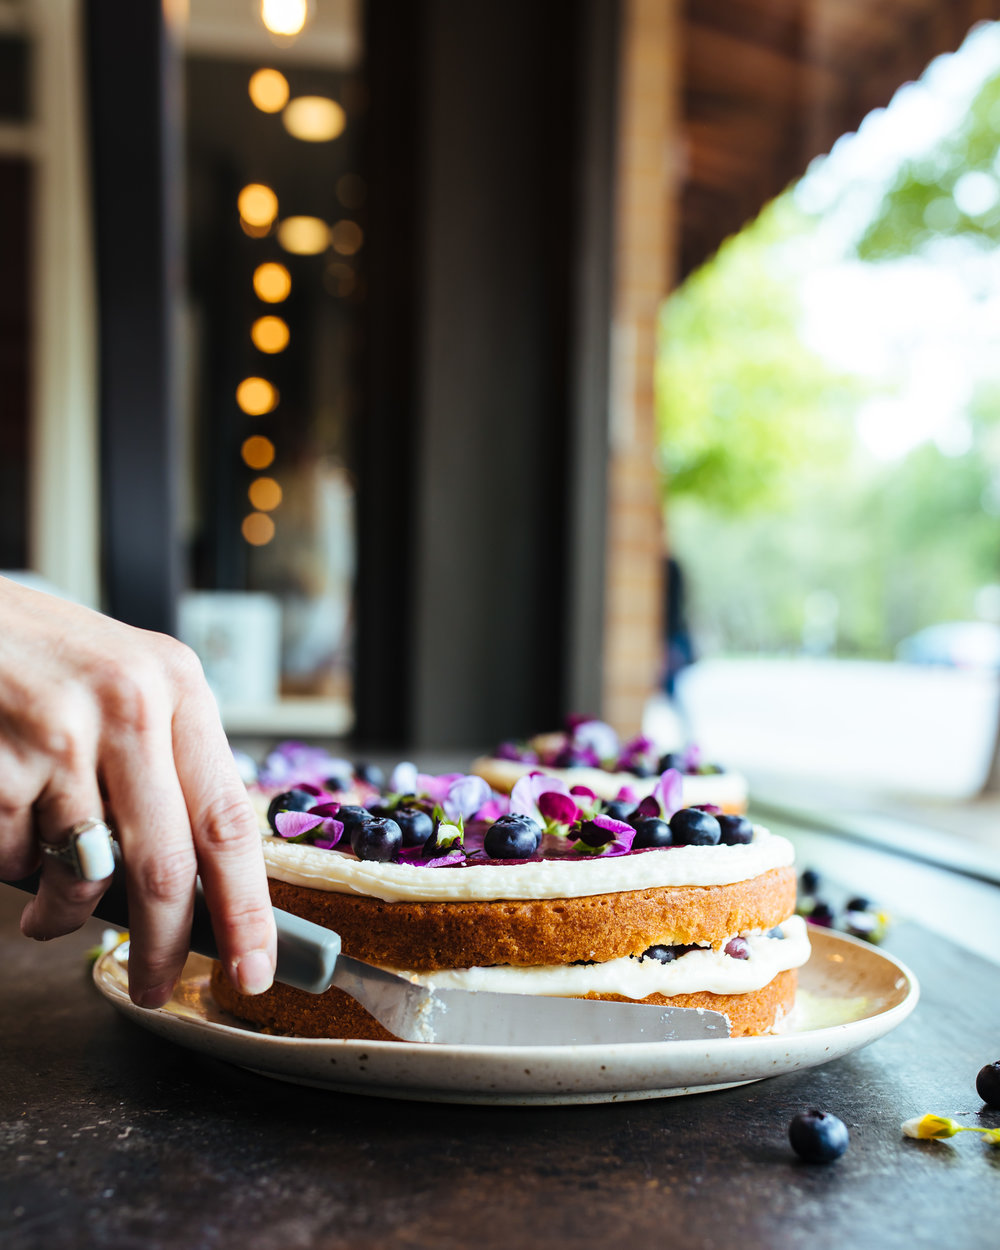 Cake Bloom Lemon Creme Fraiche Cake_Photo by Emma K Morris.jpg